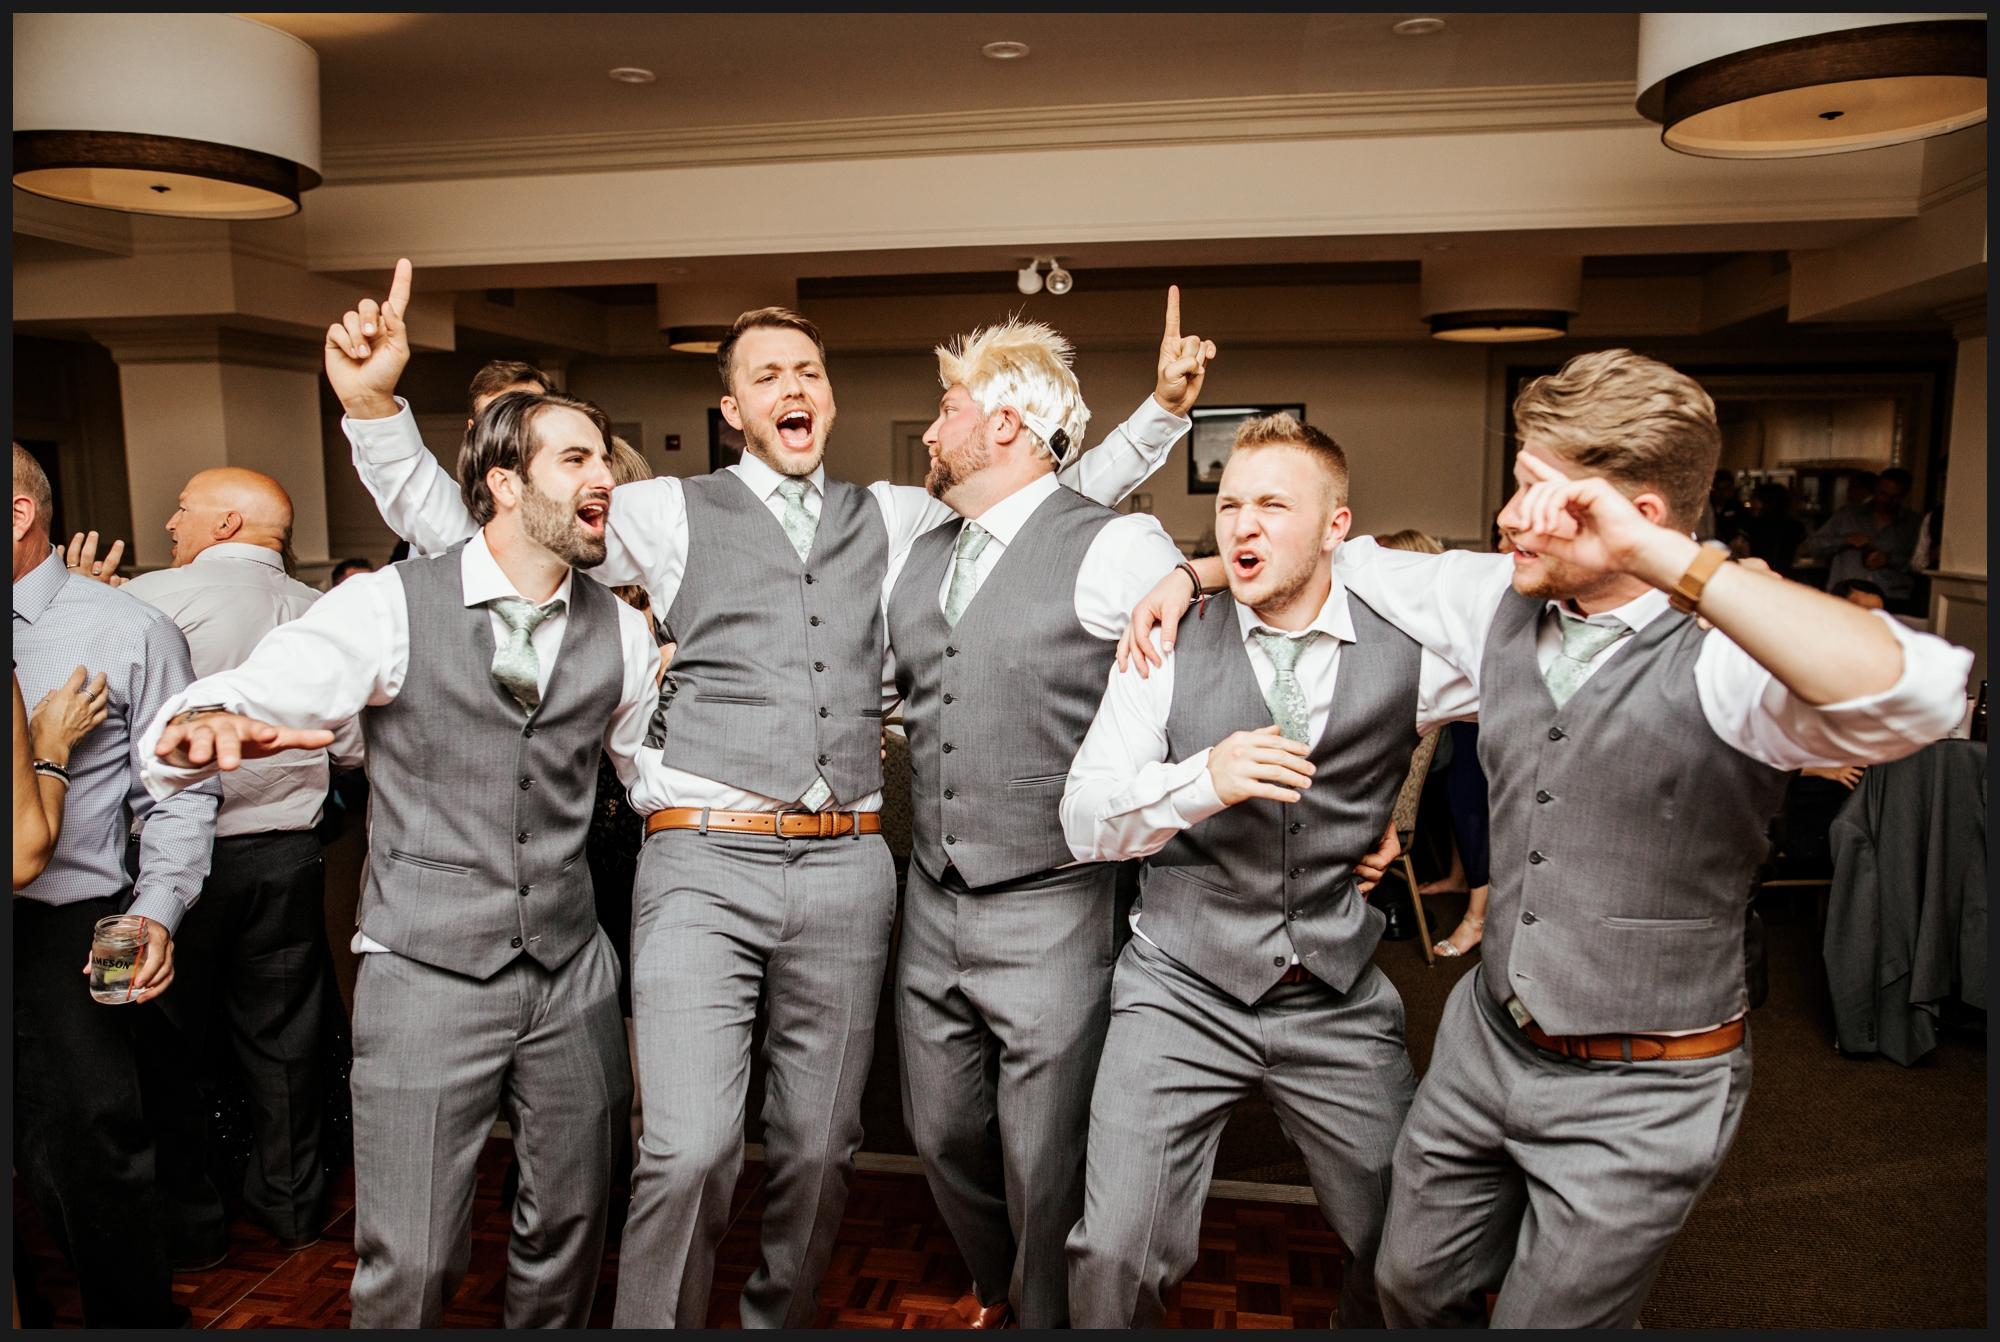 Orlando-Wedding-Photographer-destination-wedding-photographer-florida-wedding-photographer-hawaii-wedding-photographer_0170.jpg